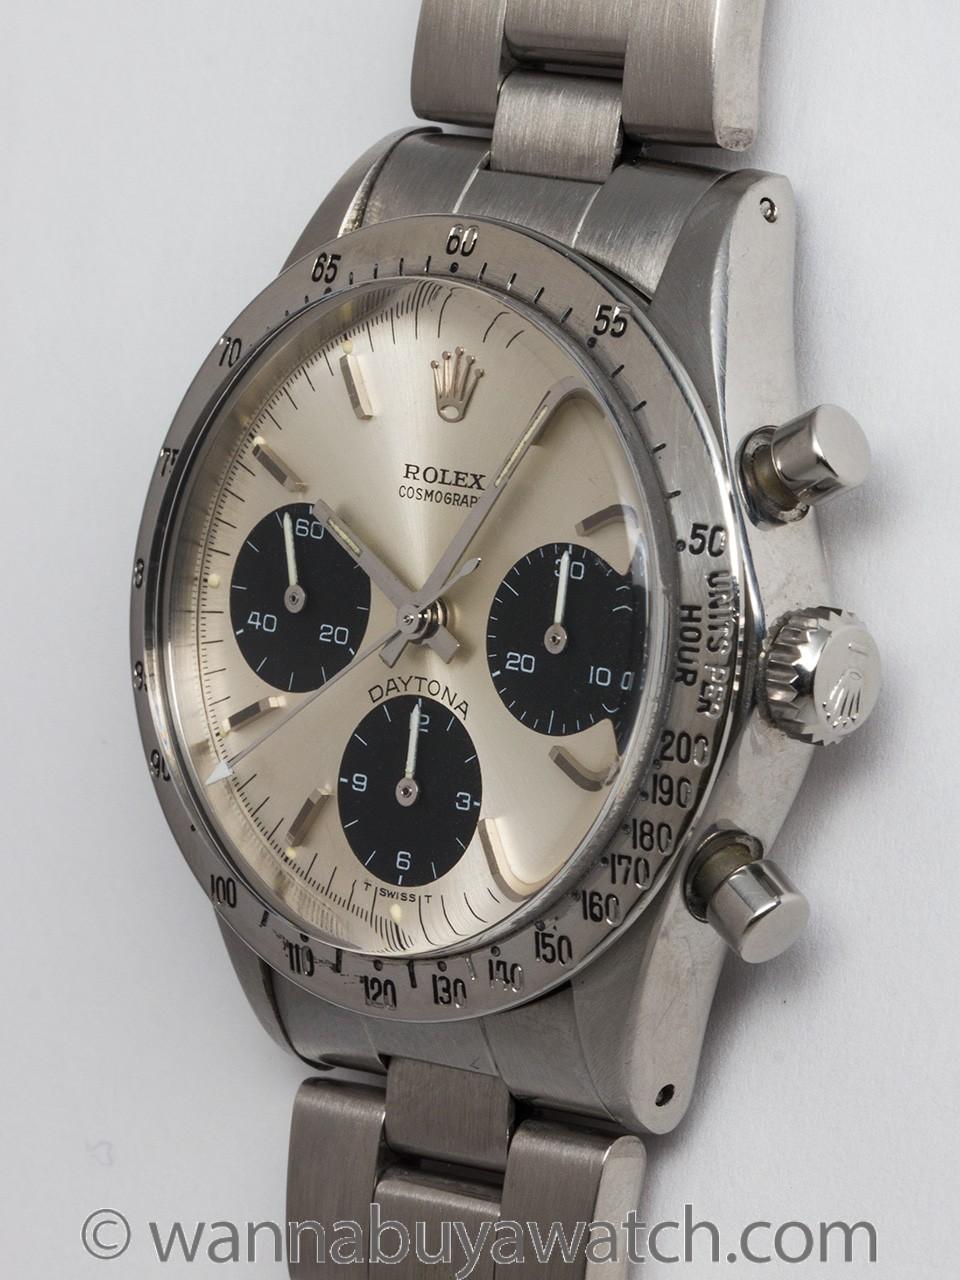 Rolex SS Daytona ref 6262 circa 1968 Service Papers